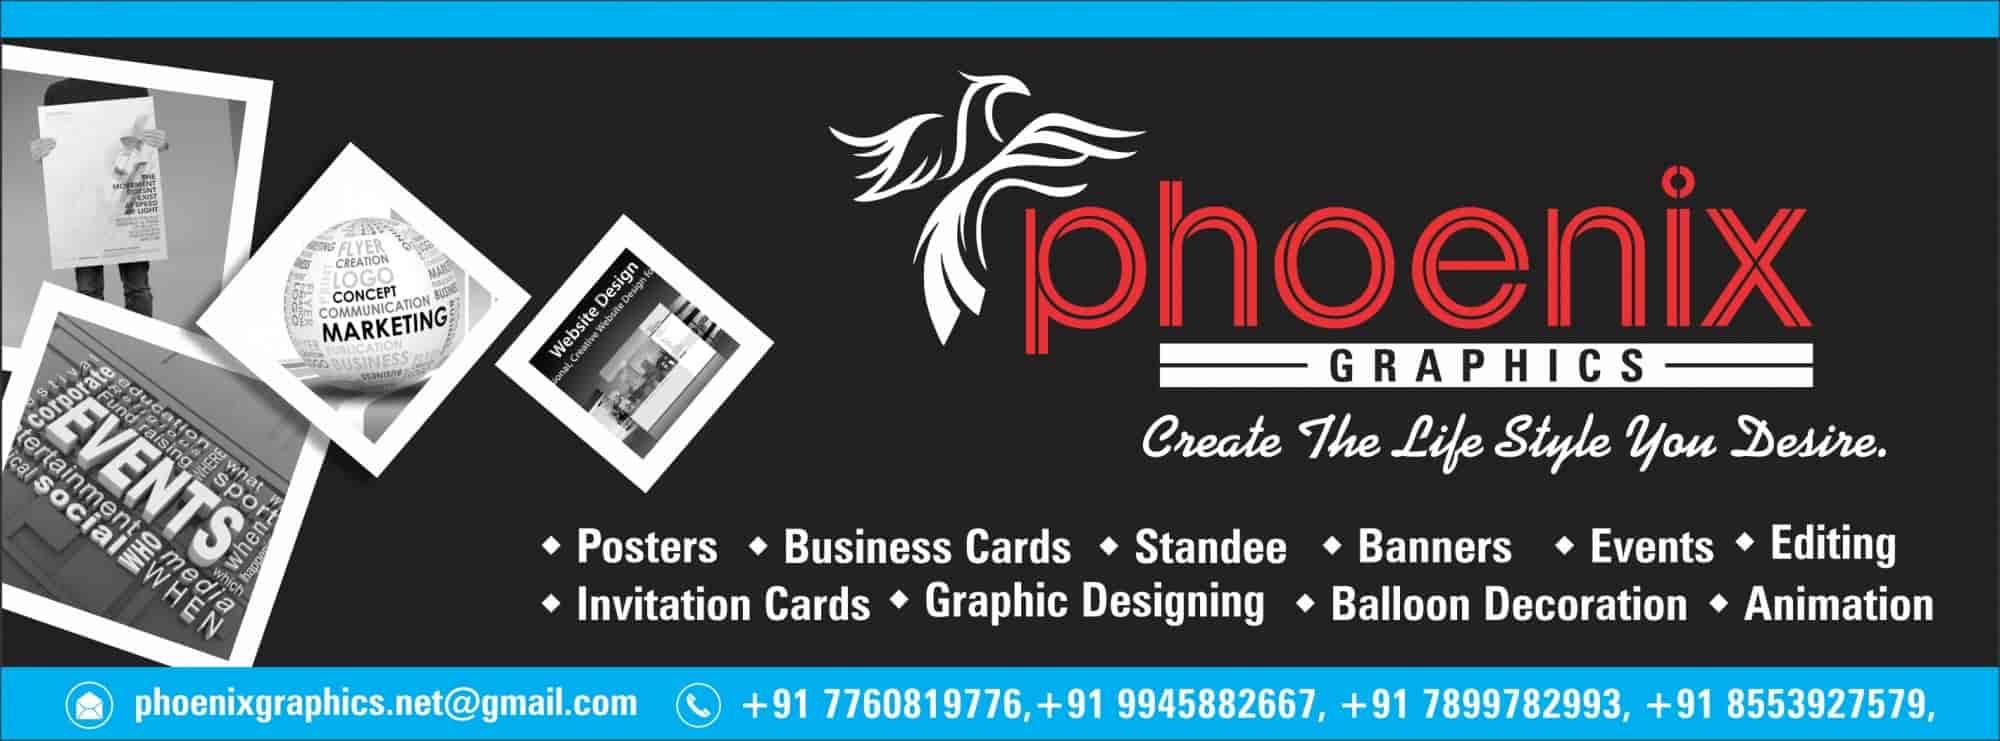 Phoenix Graphics Photos, Udayagiri, Mysore- Pictures & Images ...